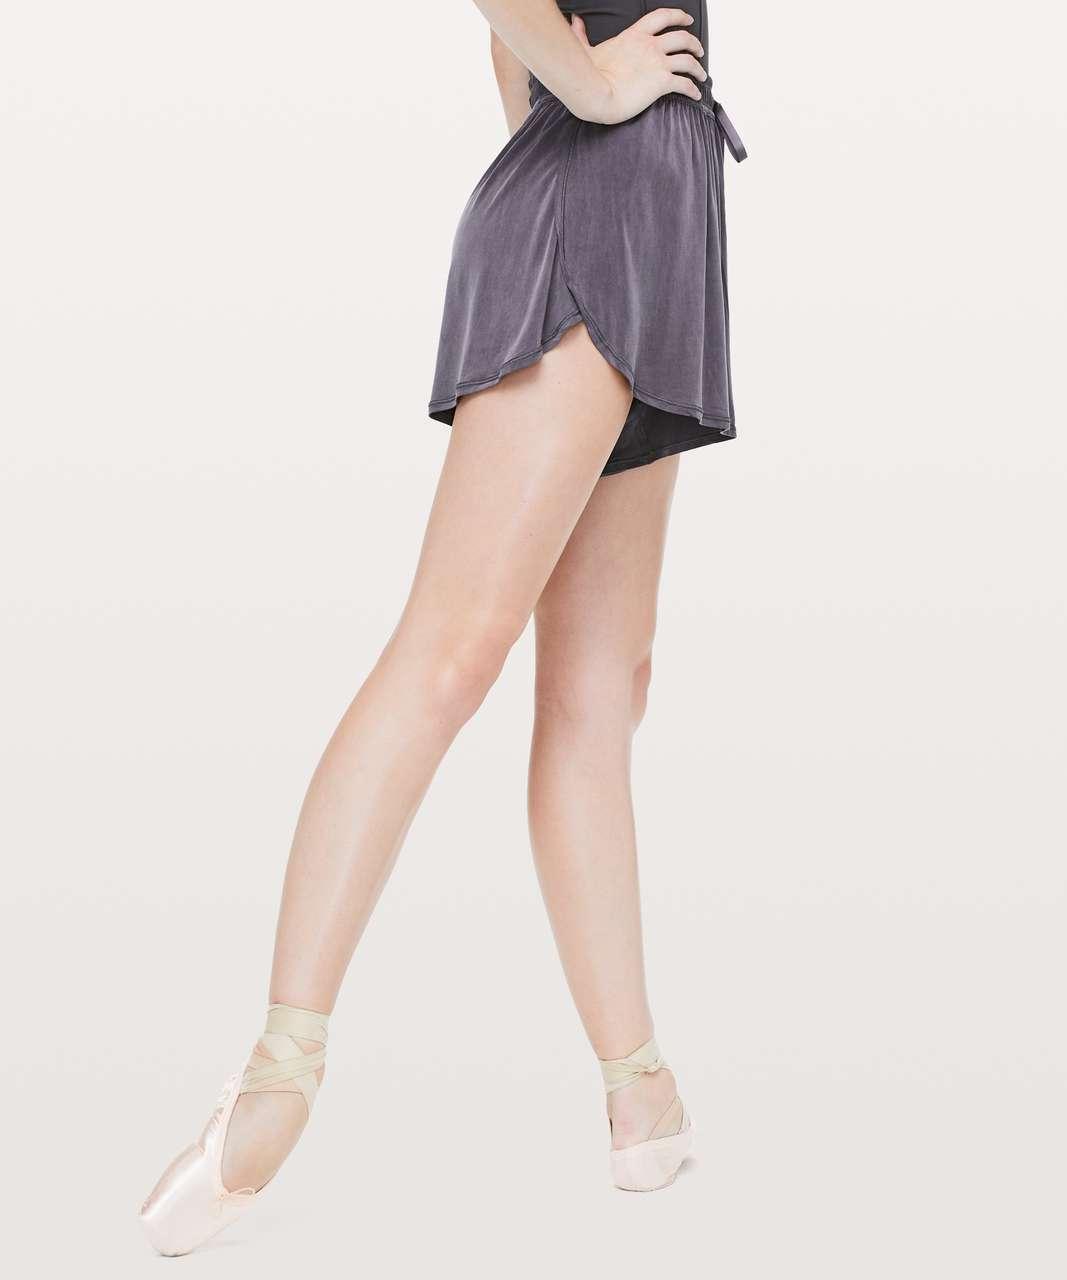 "Lululemon Principal Dancer Short *3"" - Moonwalk"